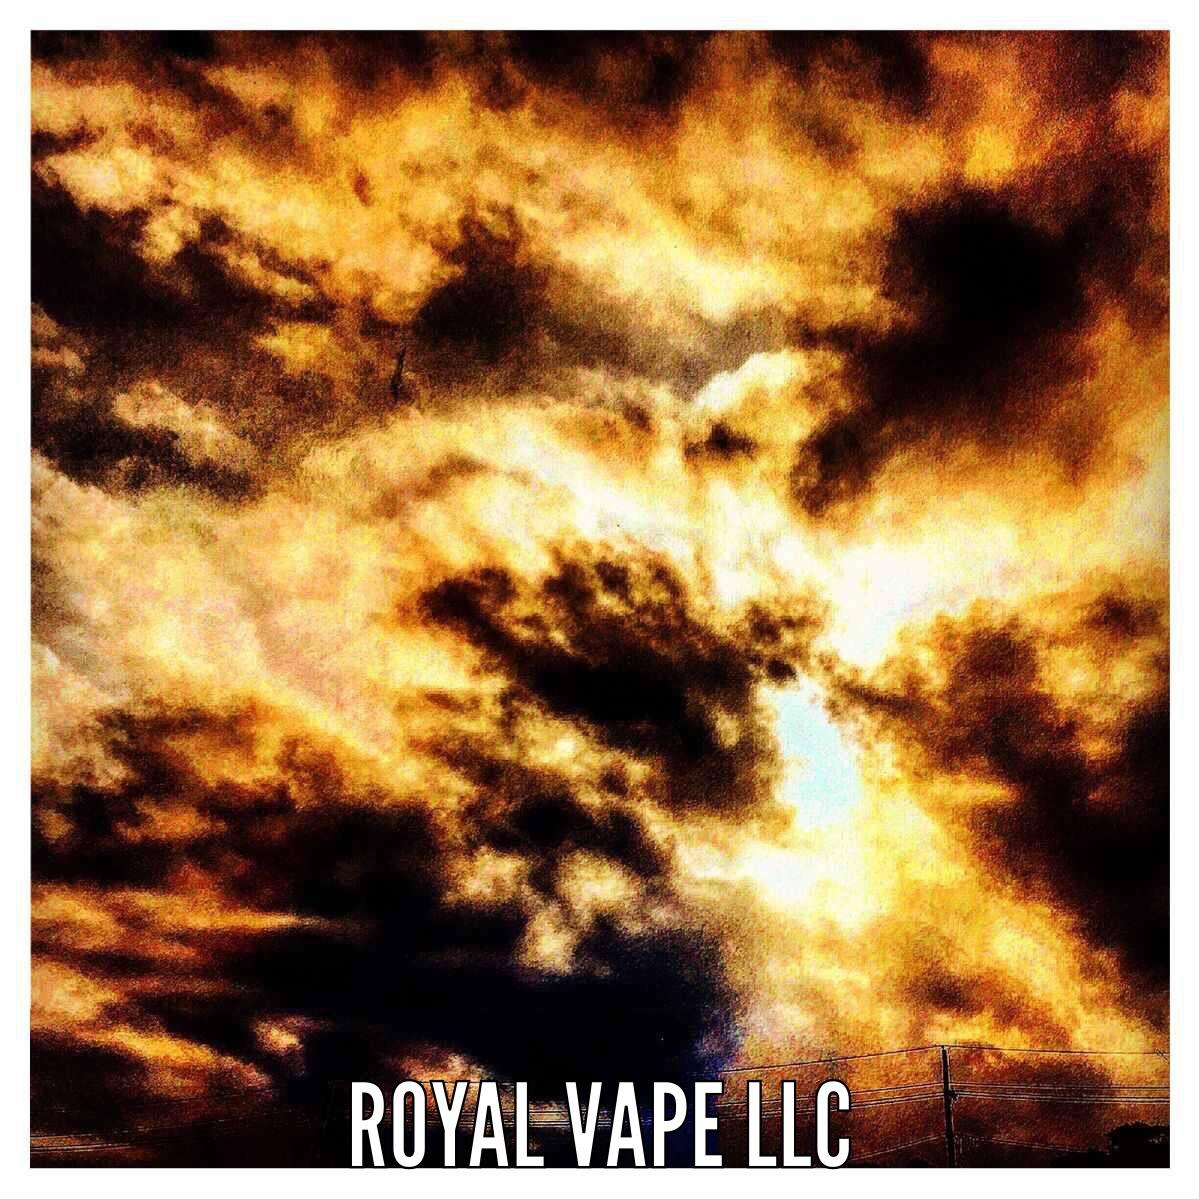 Untitled by Royal Vape 111 photos on FB/royalvapenola.com